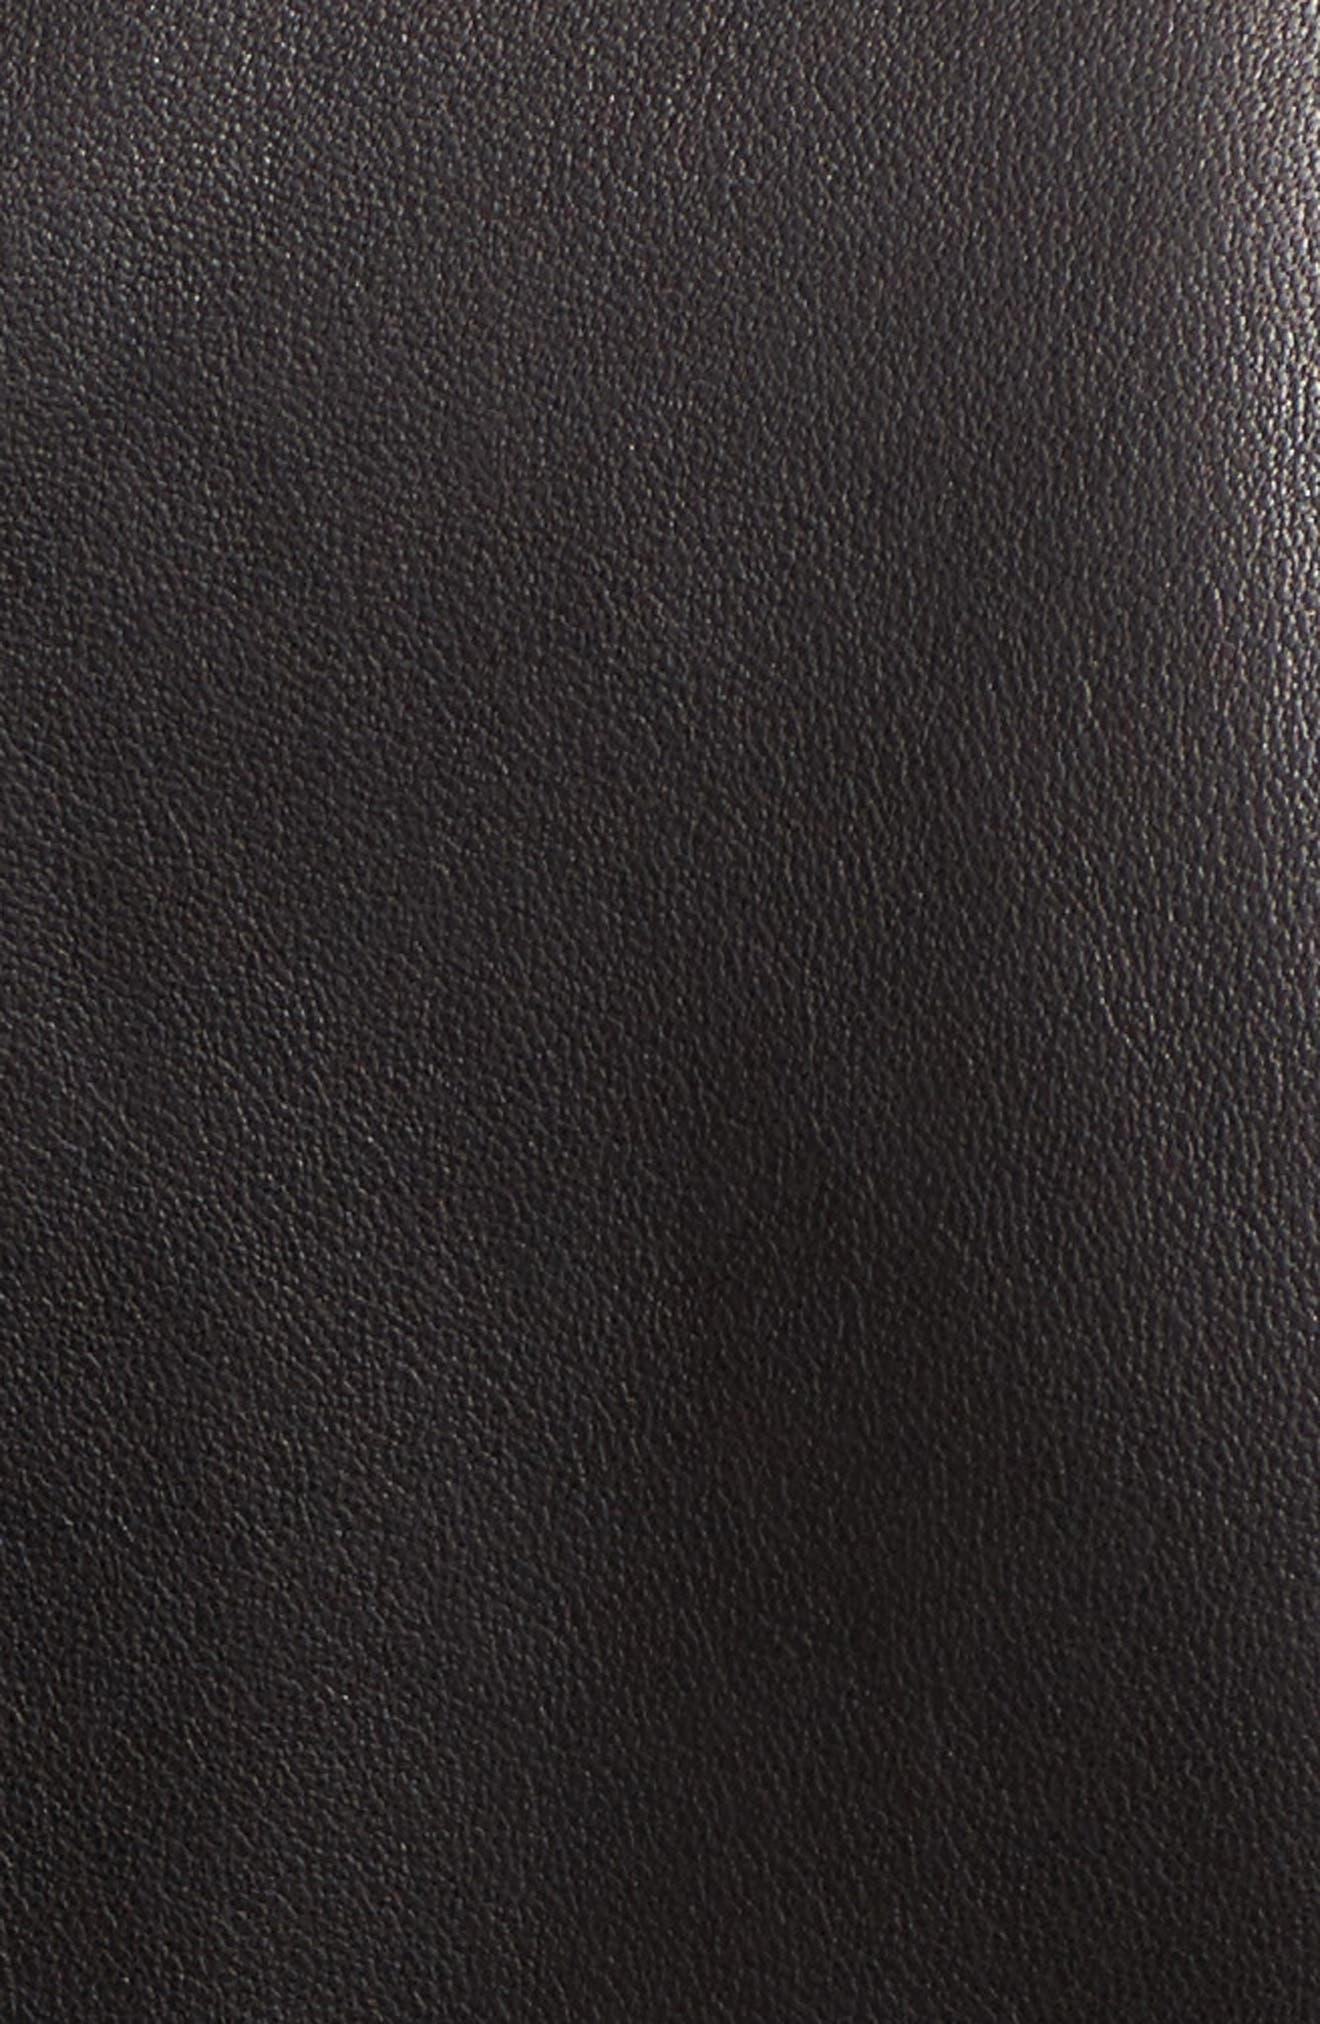 Easton Studded Leather Moto Jacket,                             Alternate thumbnail 5, color,                             Black